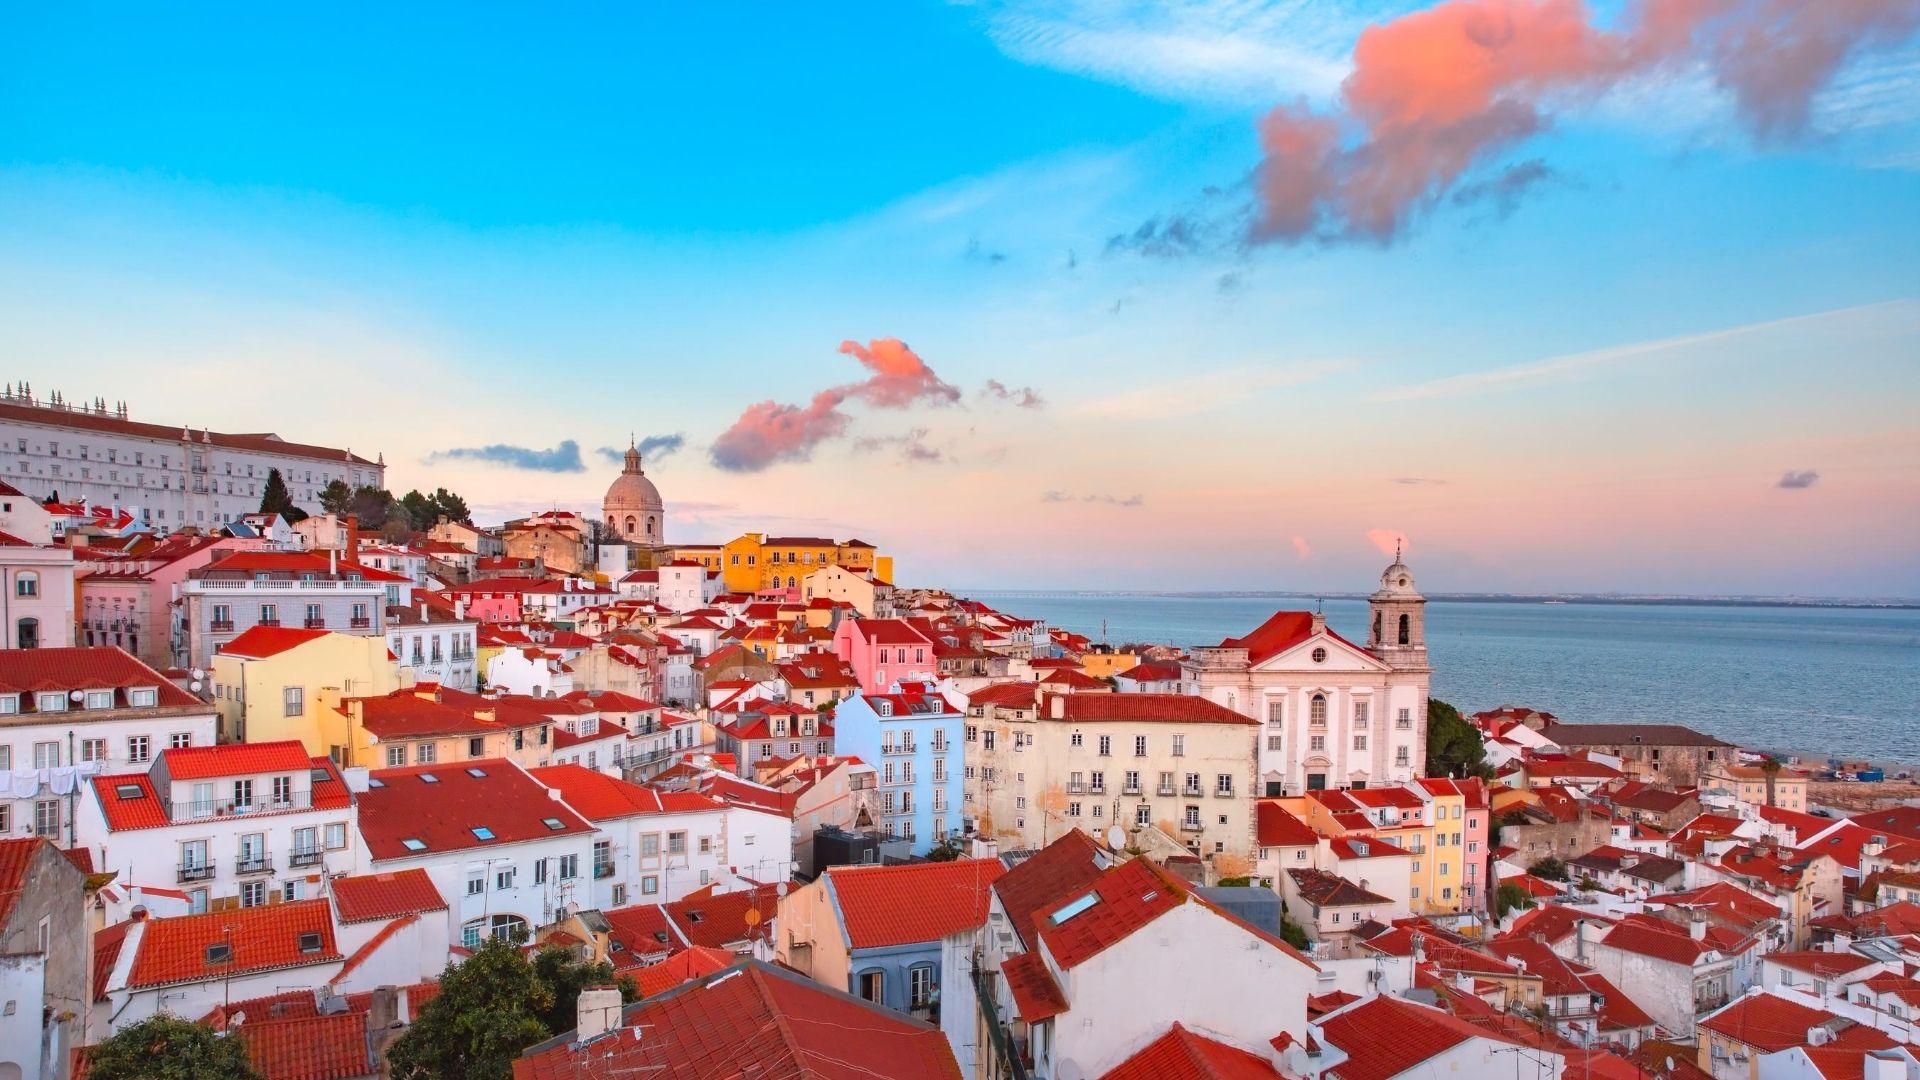 Guia completo de Lisboa: o que fazer na capital portuguesa